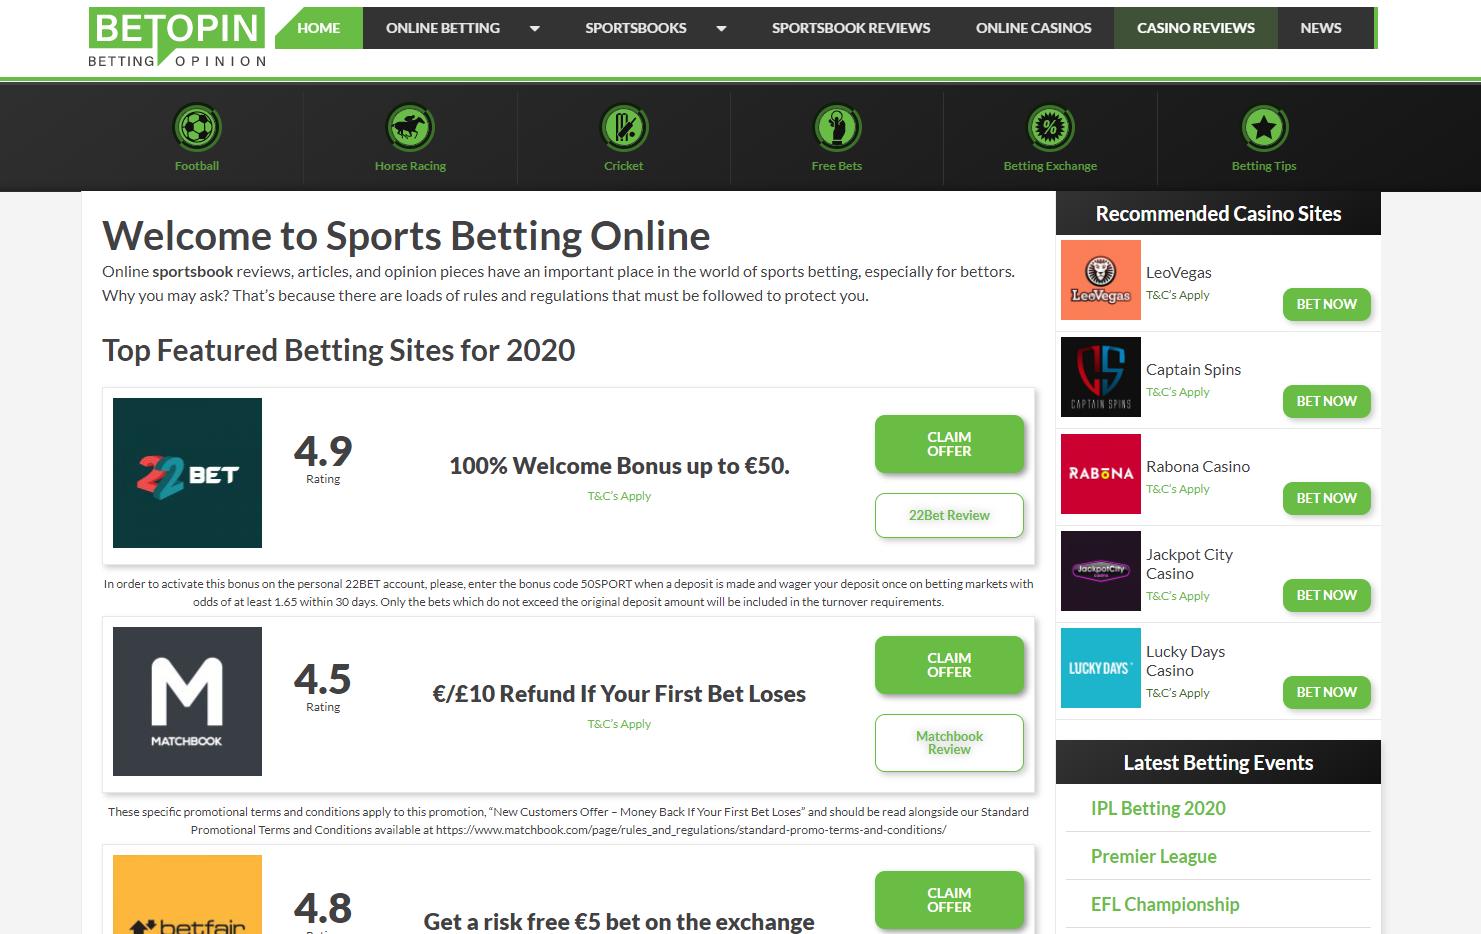 Betopin - Sports Betting Online screenshot